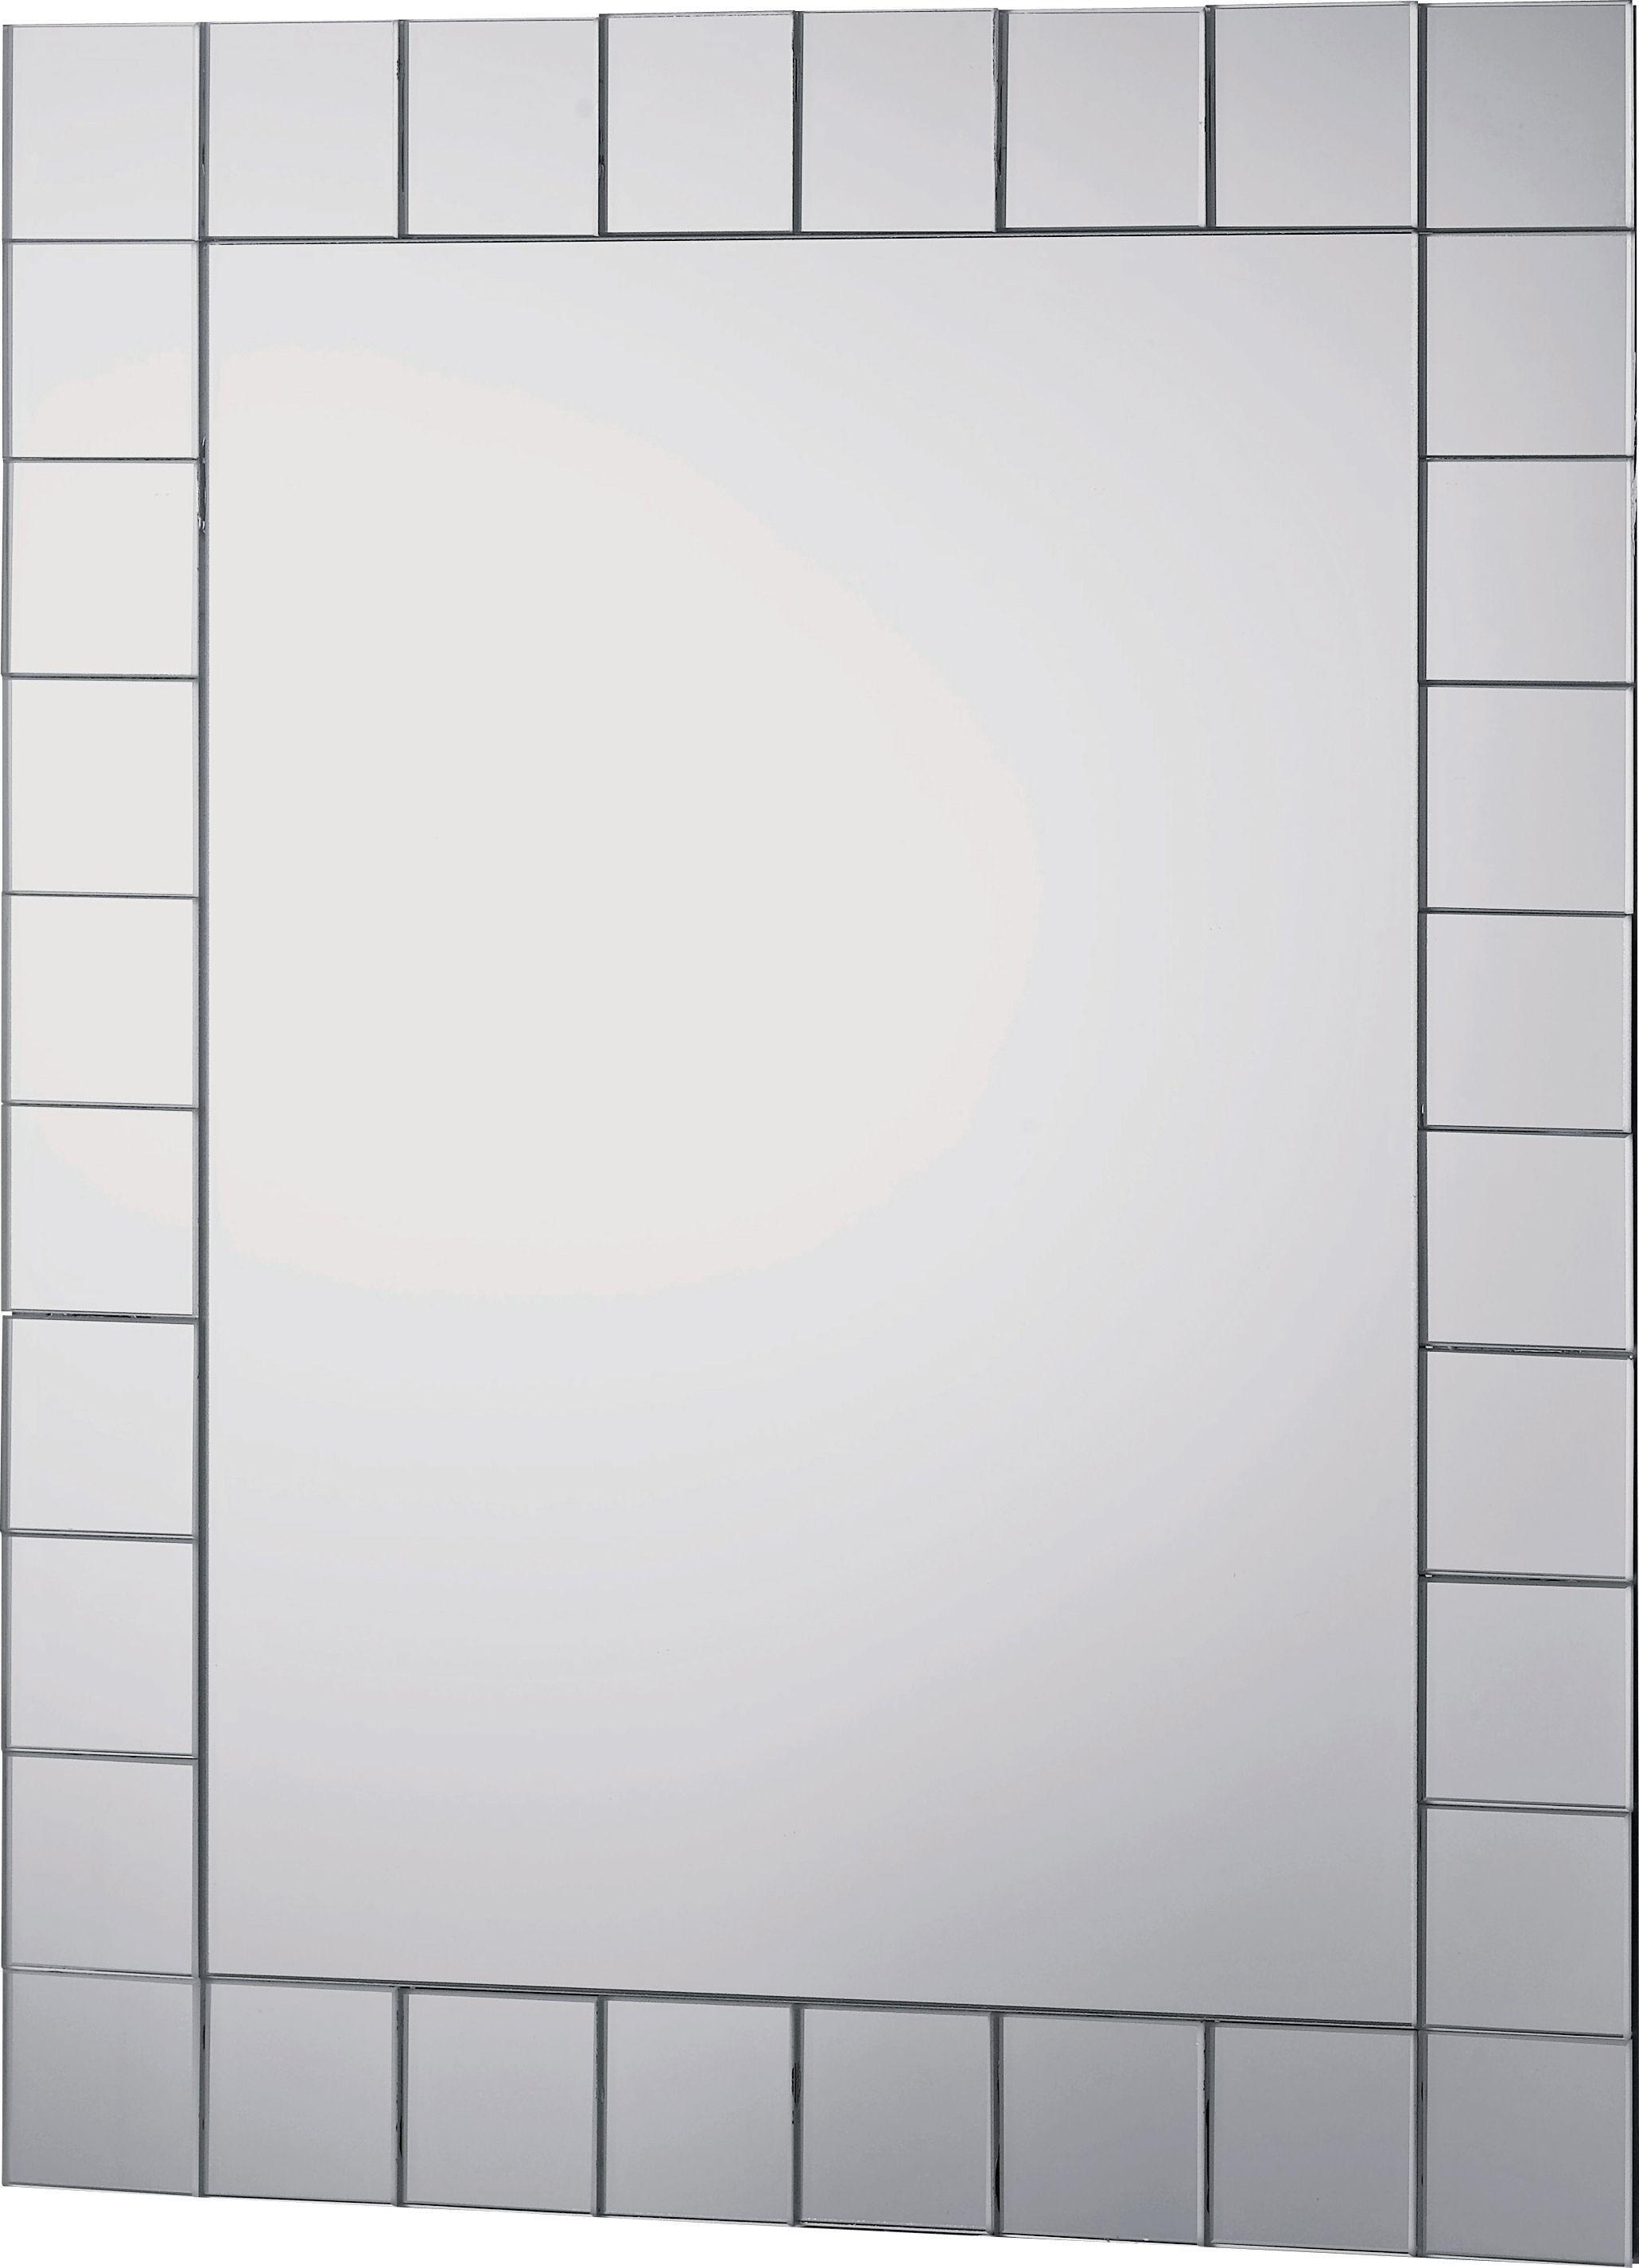 Bathroom Mirror Uk buy collection rectangular mosaic bathroom mirror at argos.co.uk